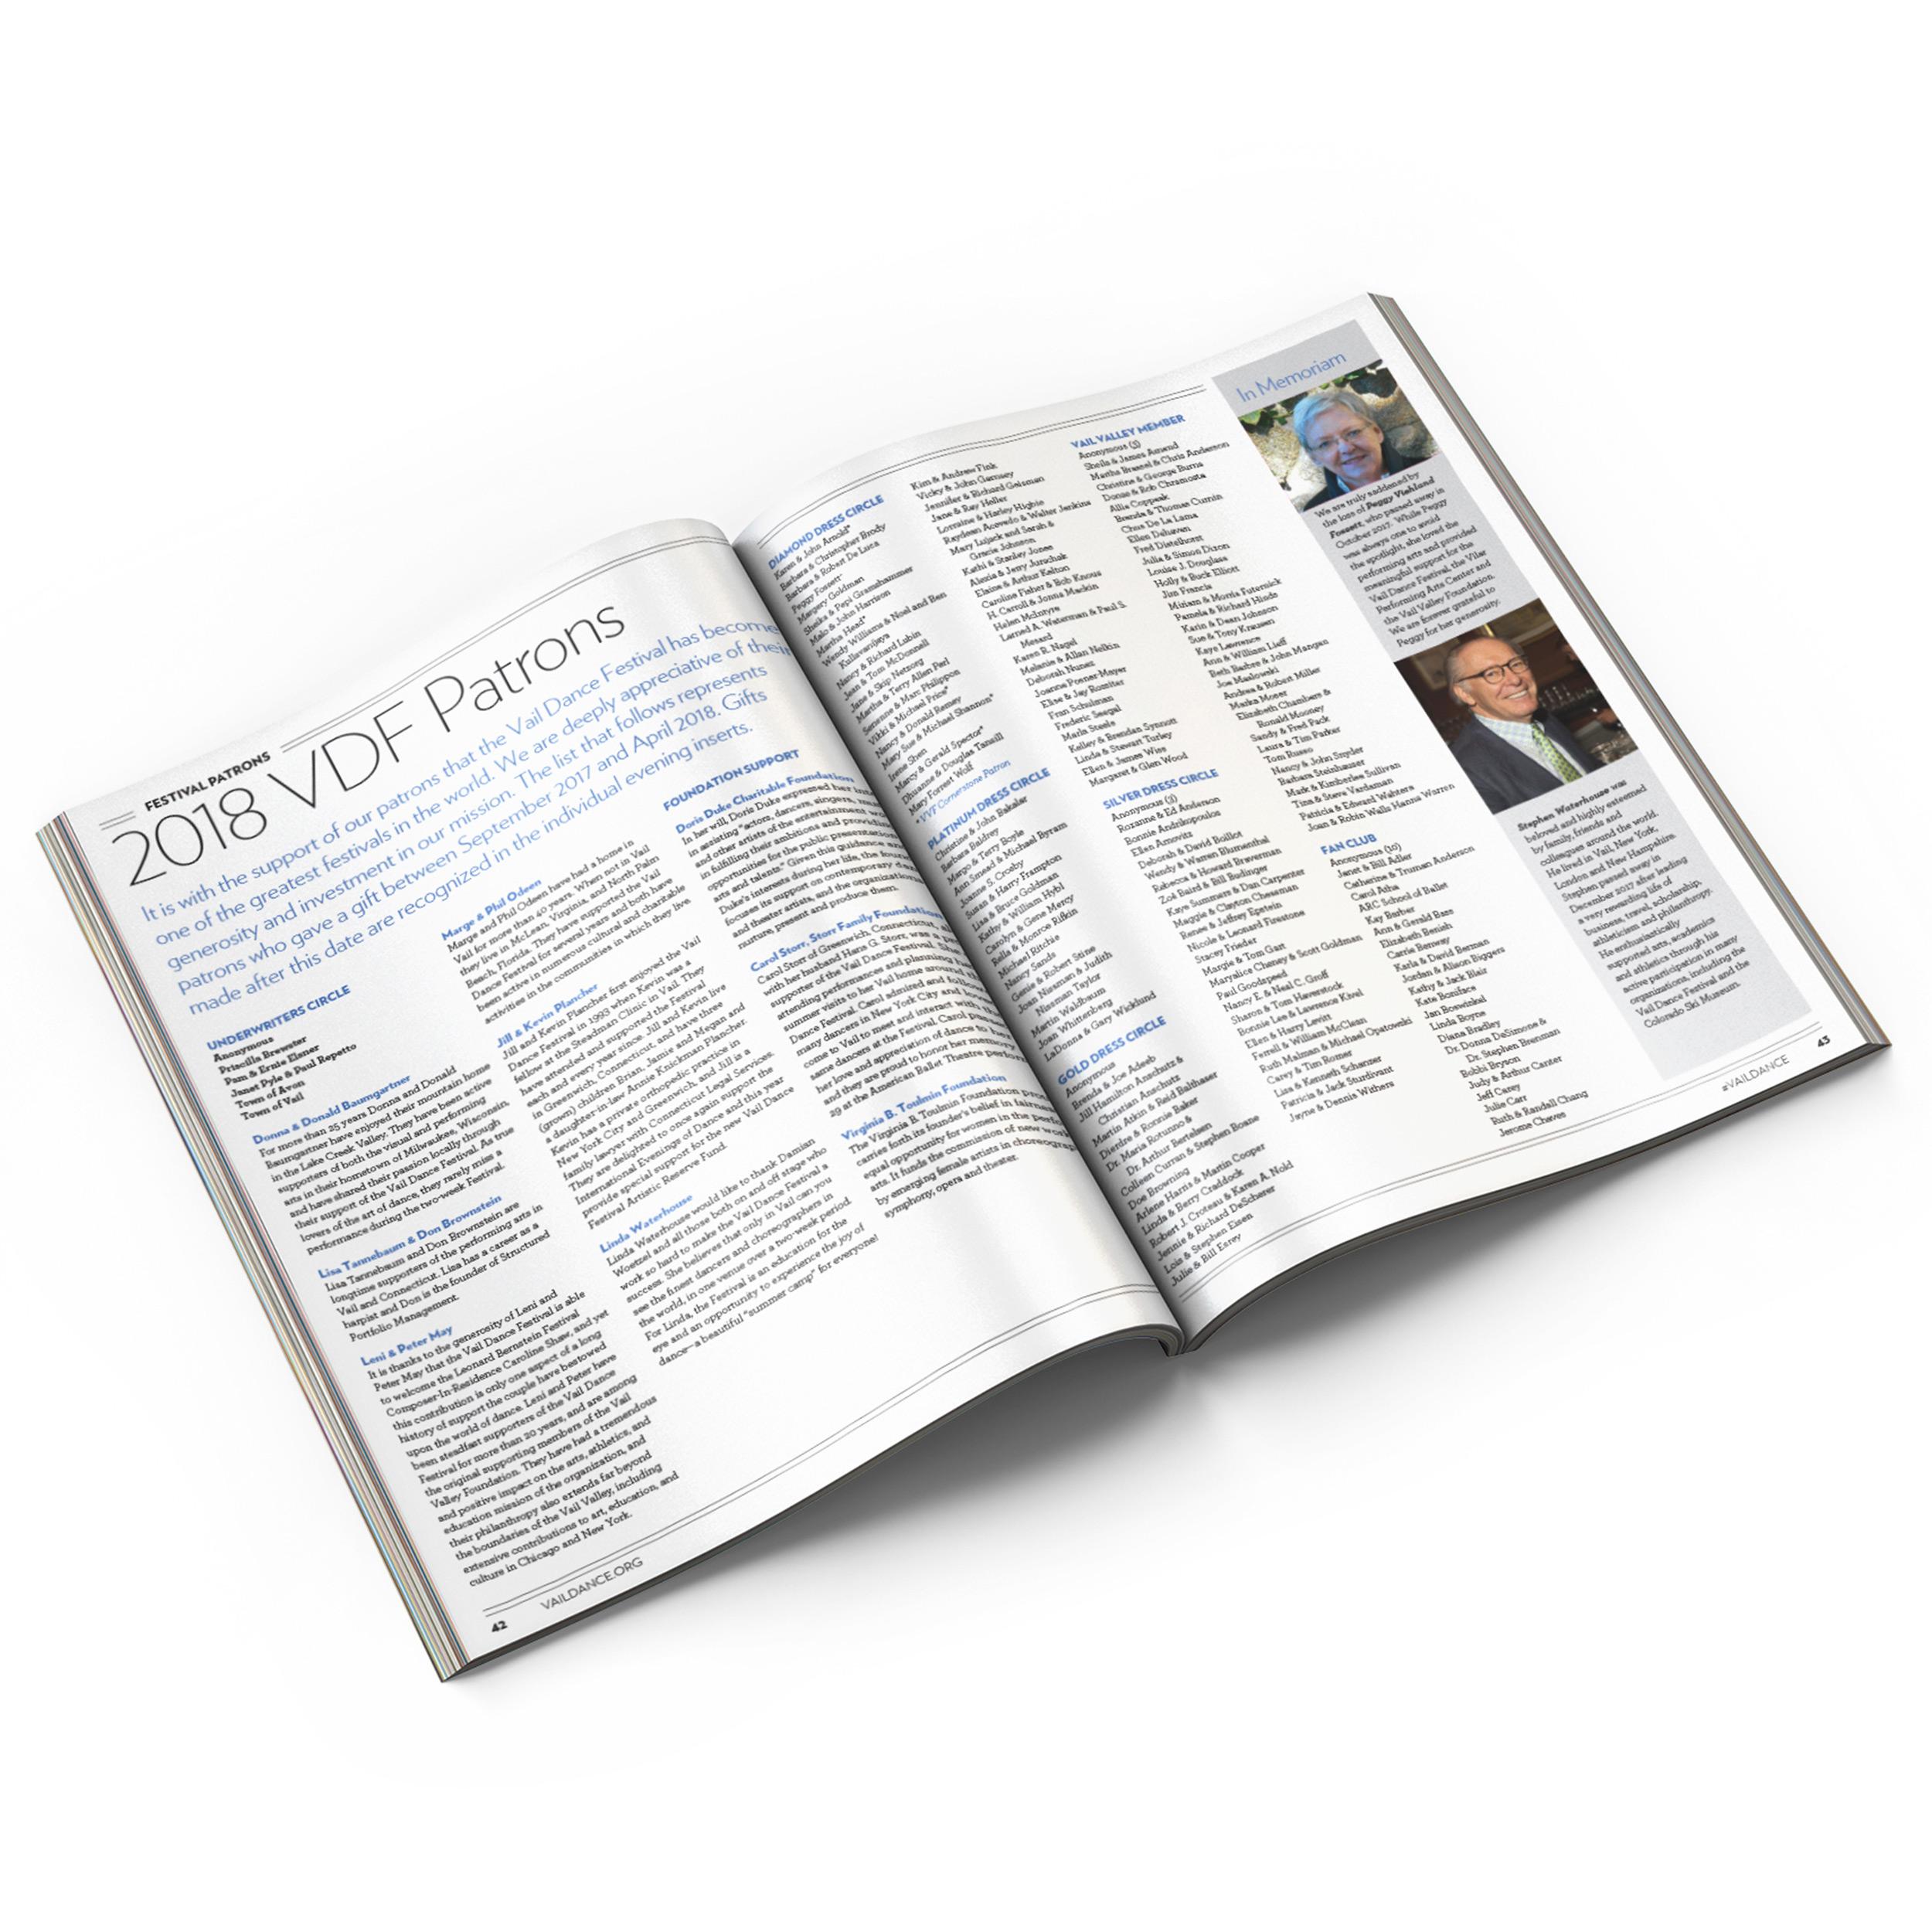 2018-vdf_advertising_magazine-pg11-12.jpg